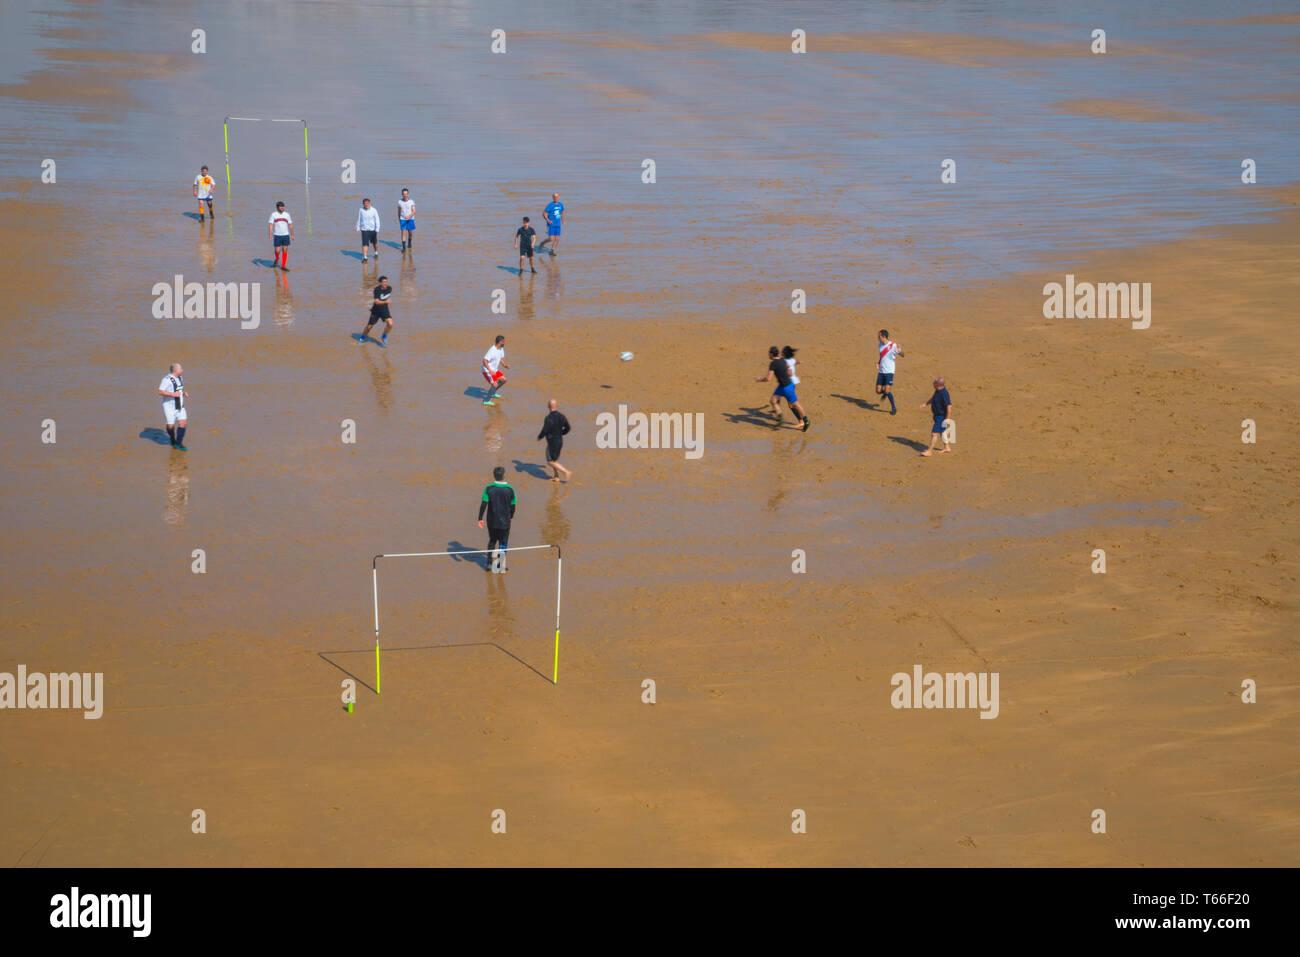 Group of men playing football on wet sand. El Sardinero beach, Santander, Spain. - Stock Image